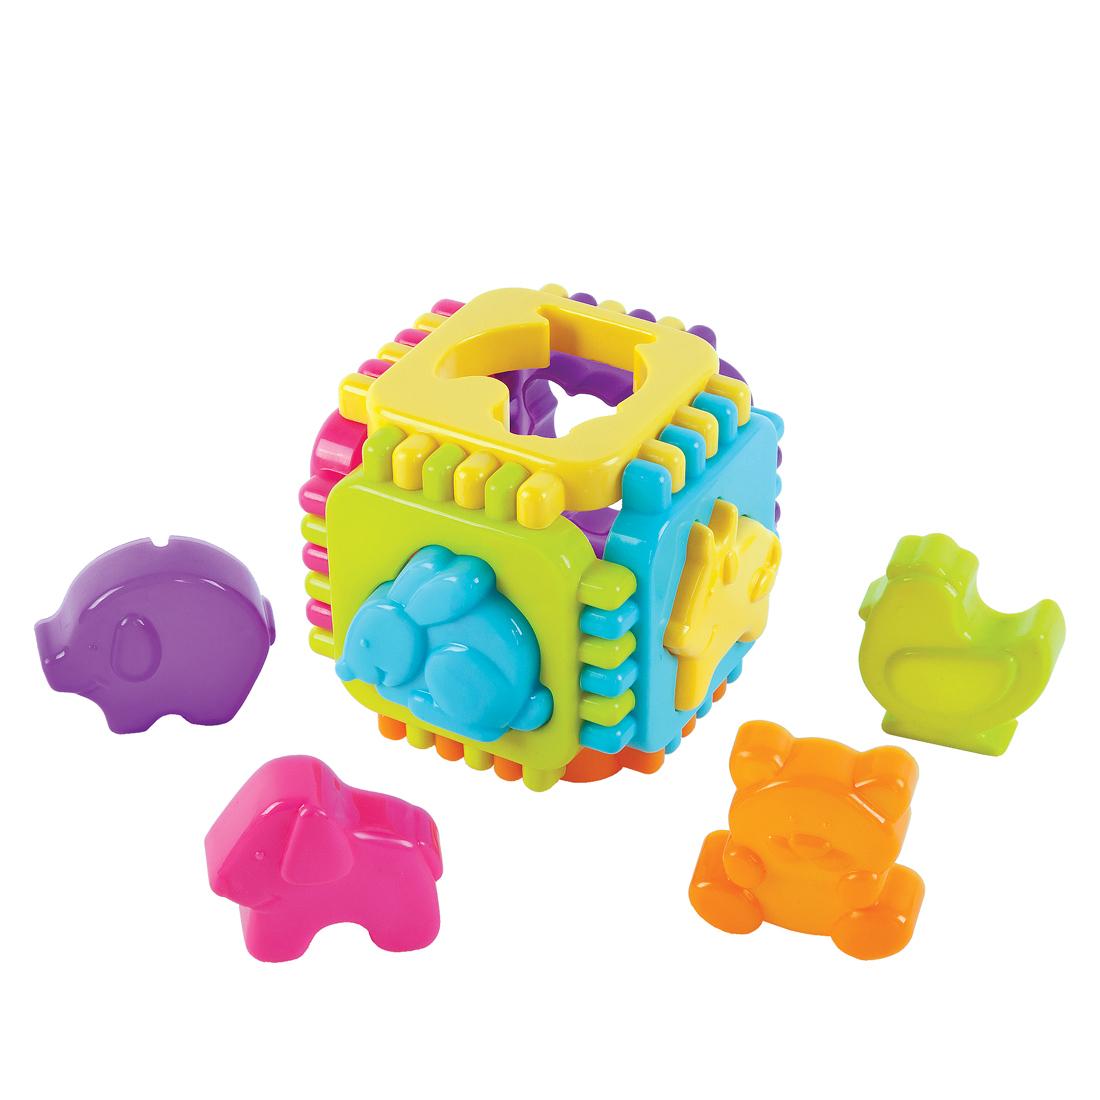 Сортер Наша игрушка Веселые животные сортер жирафики веселые животные